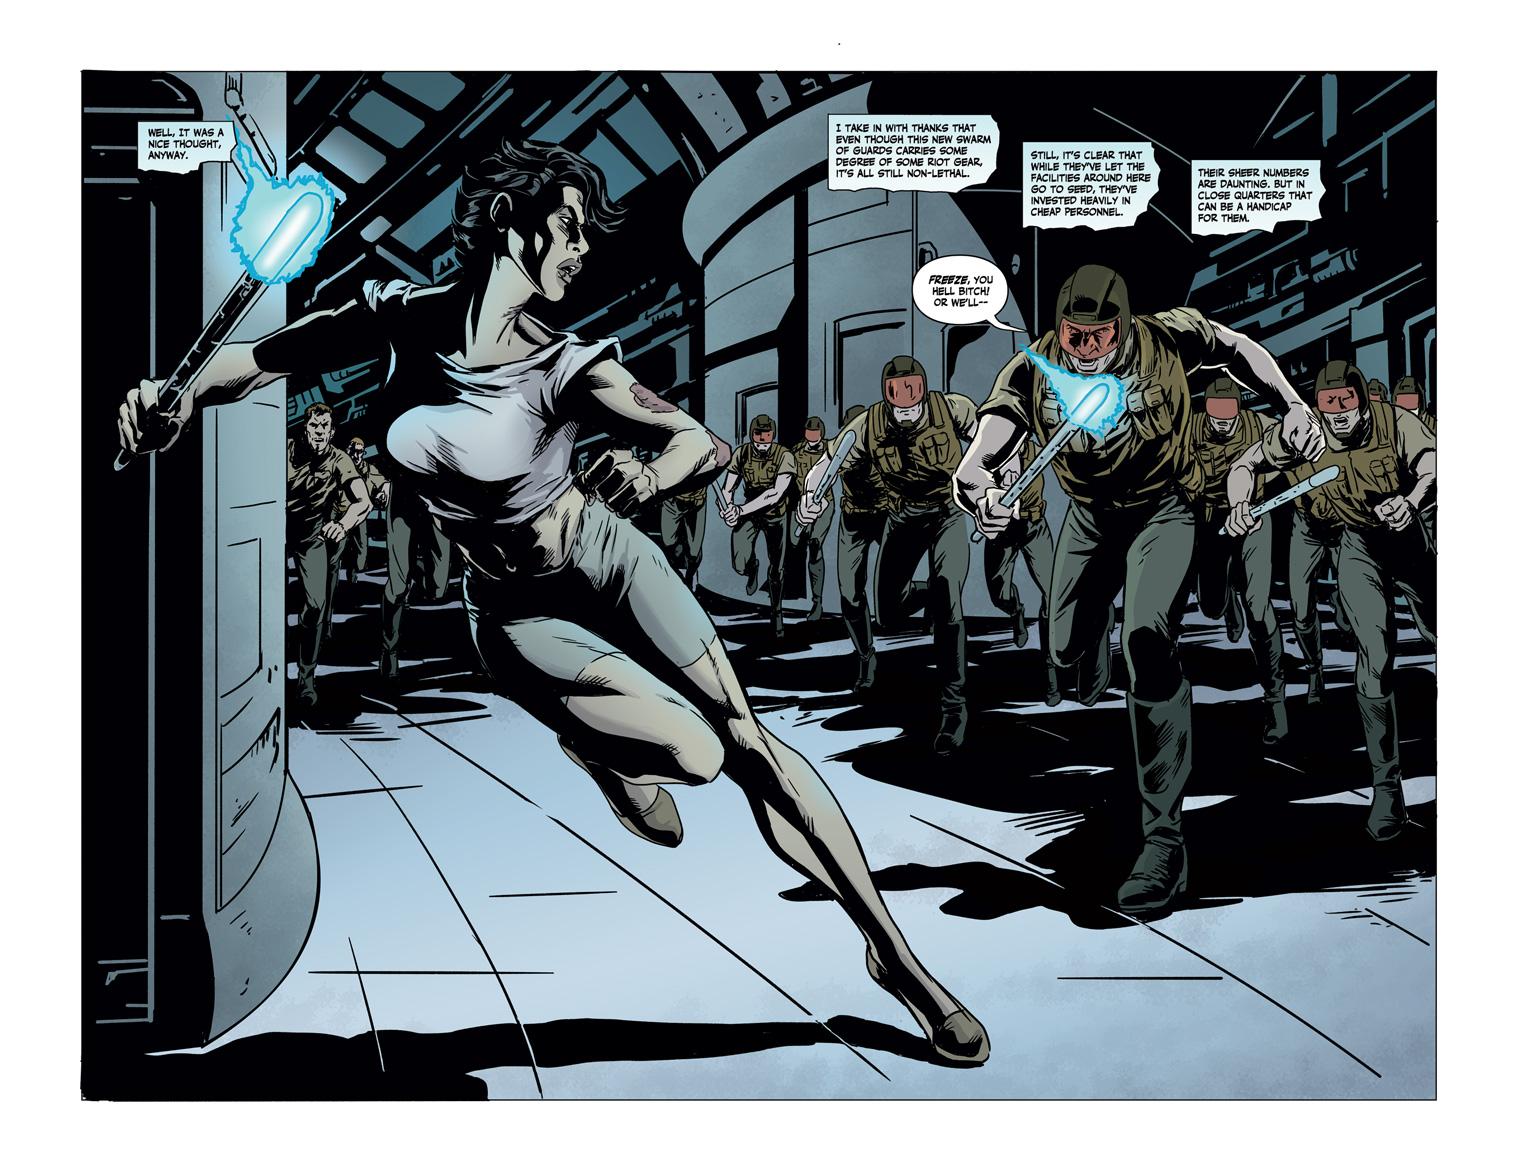 The Darkstar Zephyr page 42-43